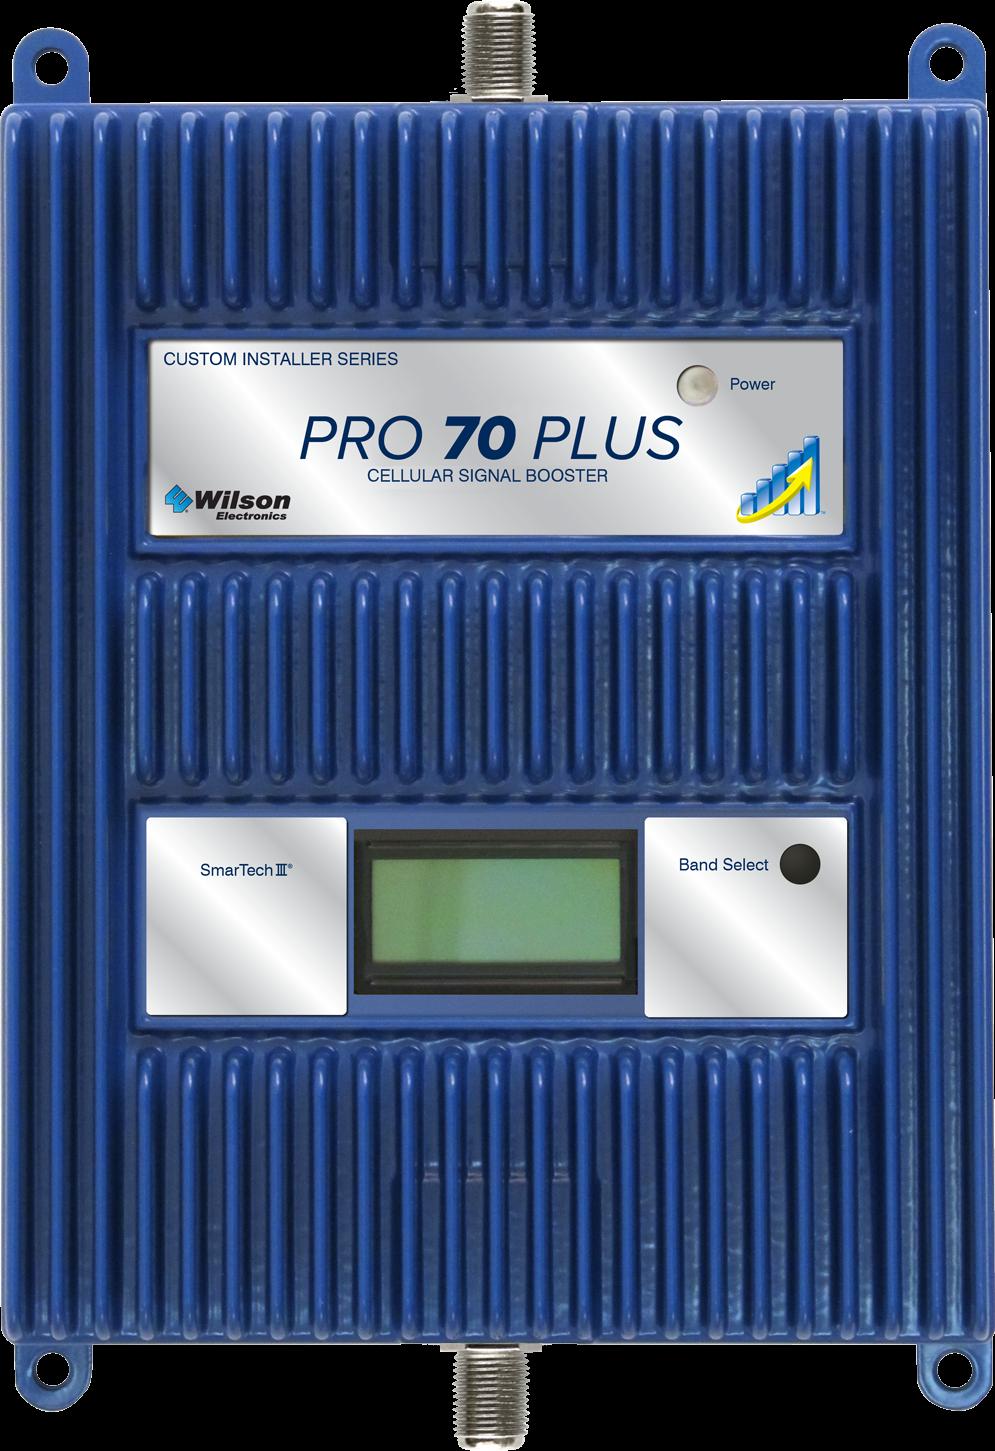 WilsonPro Pro 70 Plus